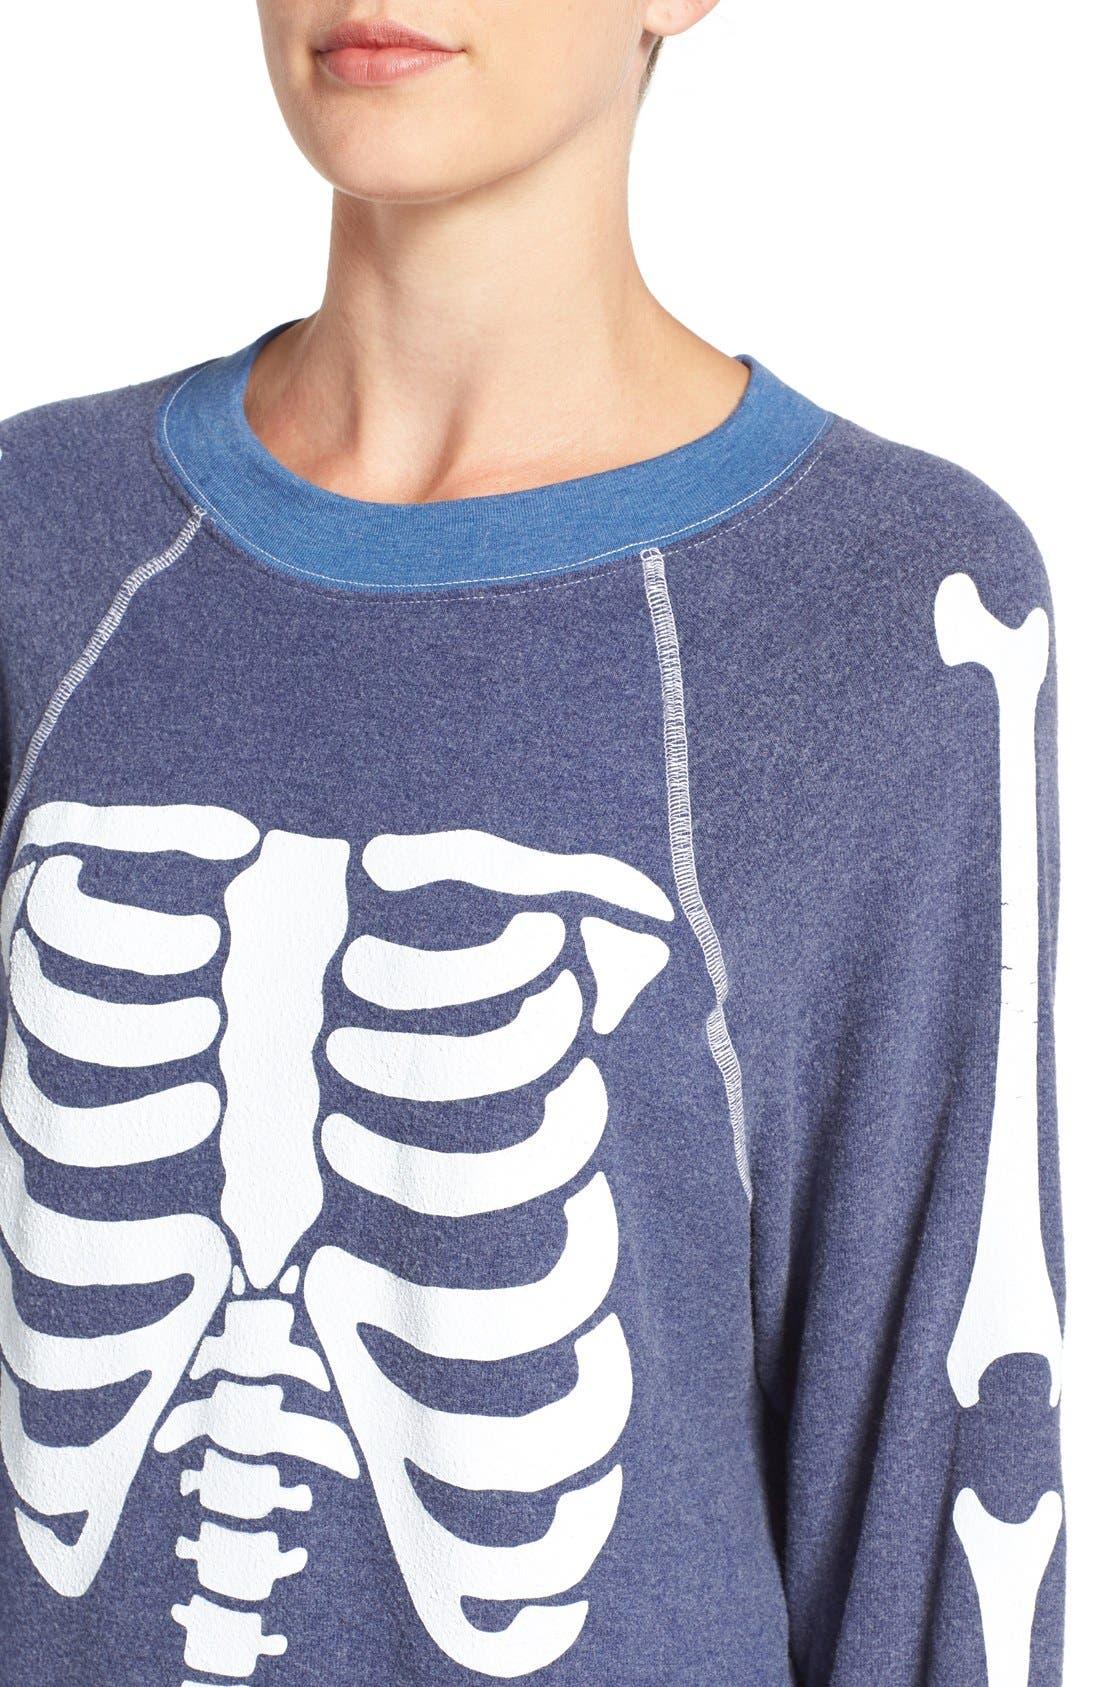 'Inside Out' Skeleton Print Pullover,                             Alternate thumbnail 5, color,                             401